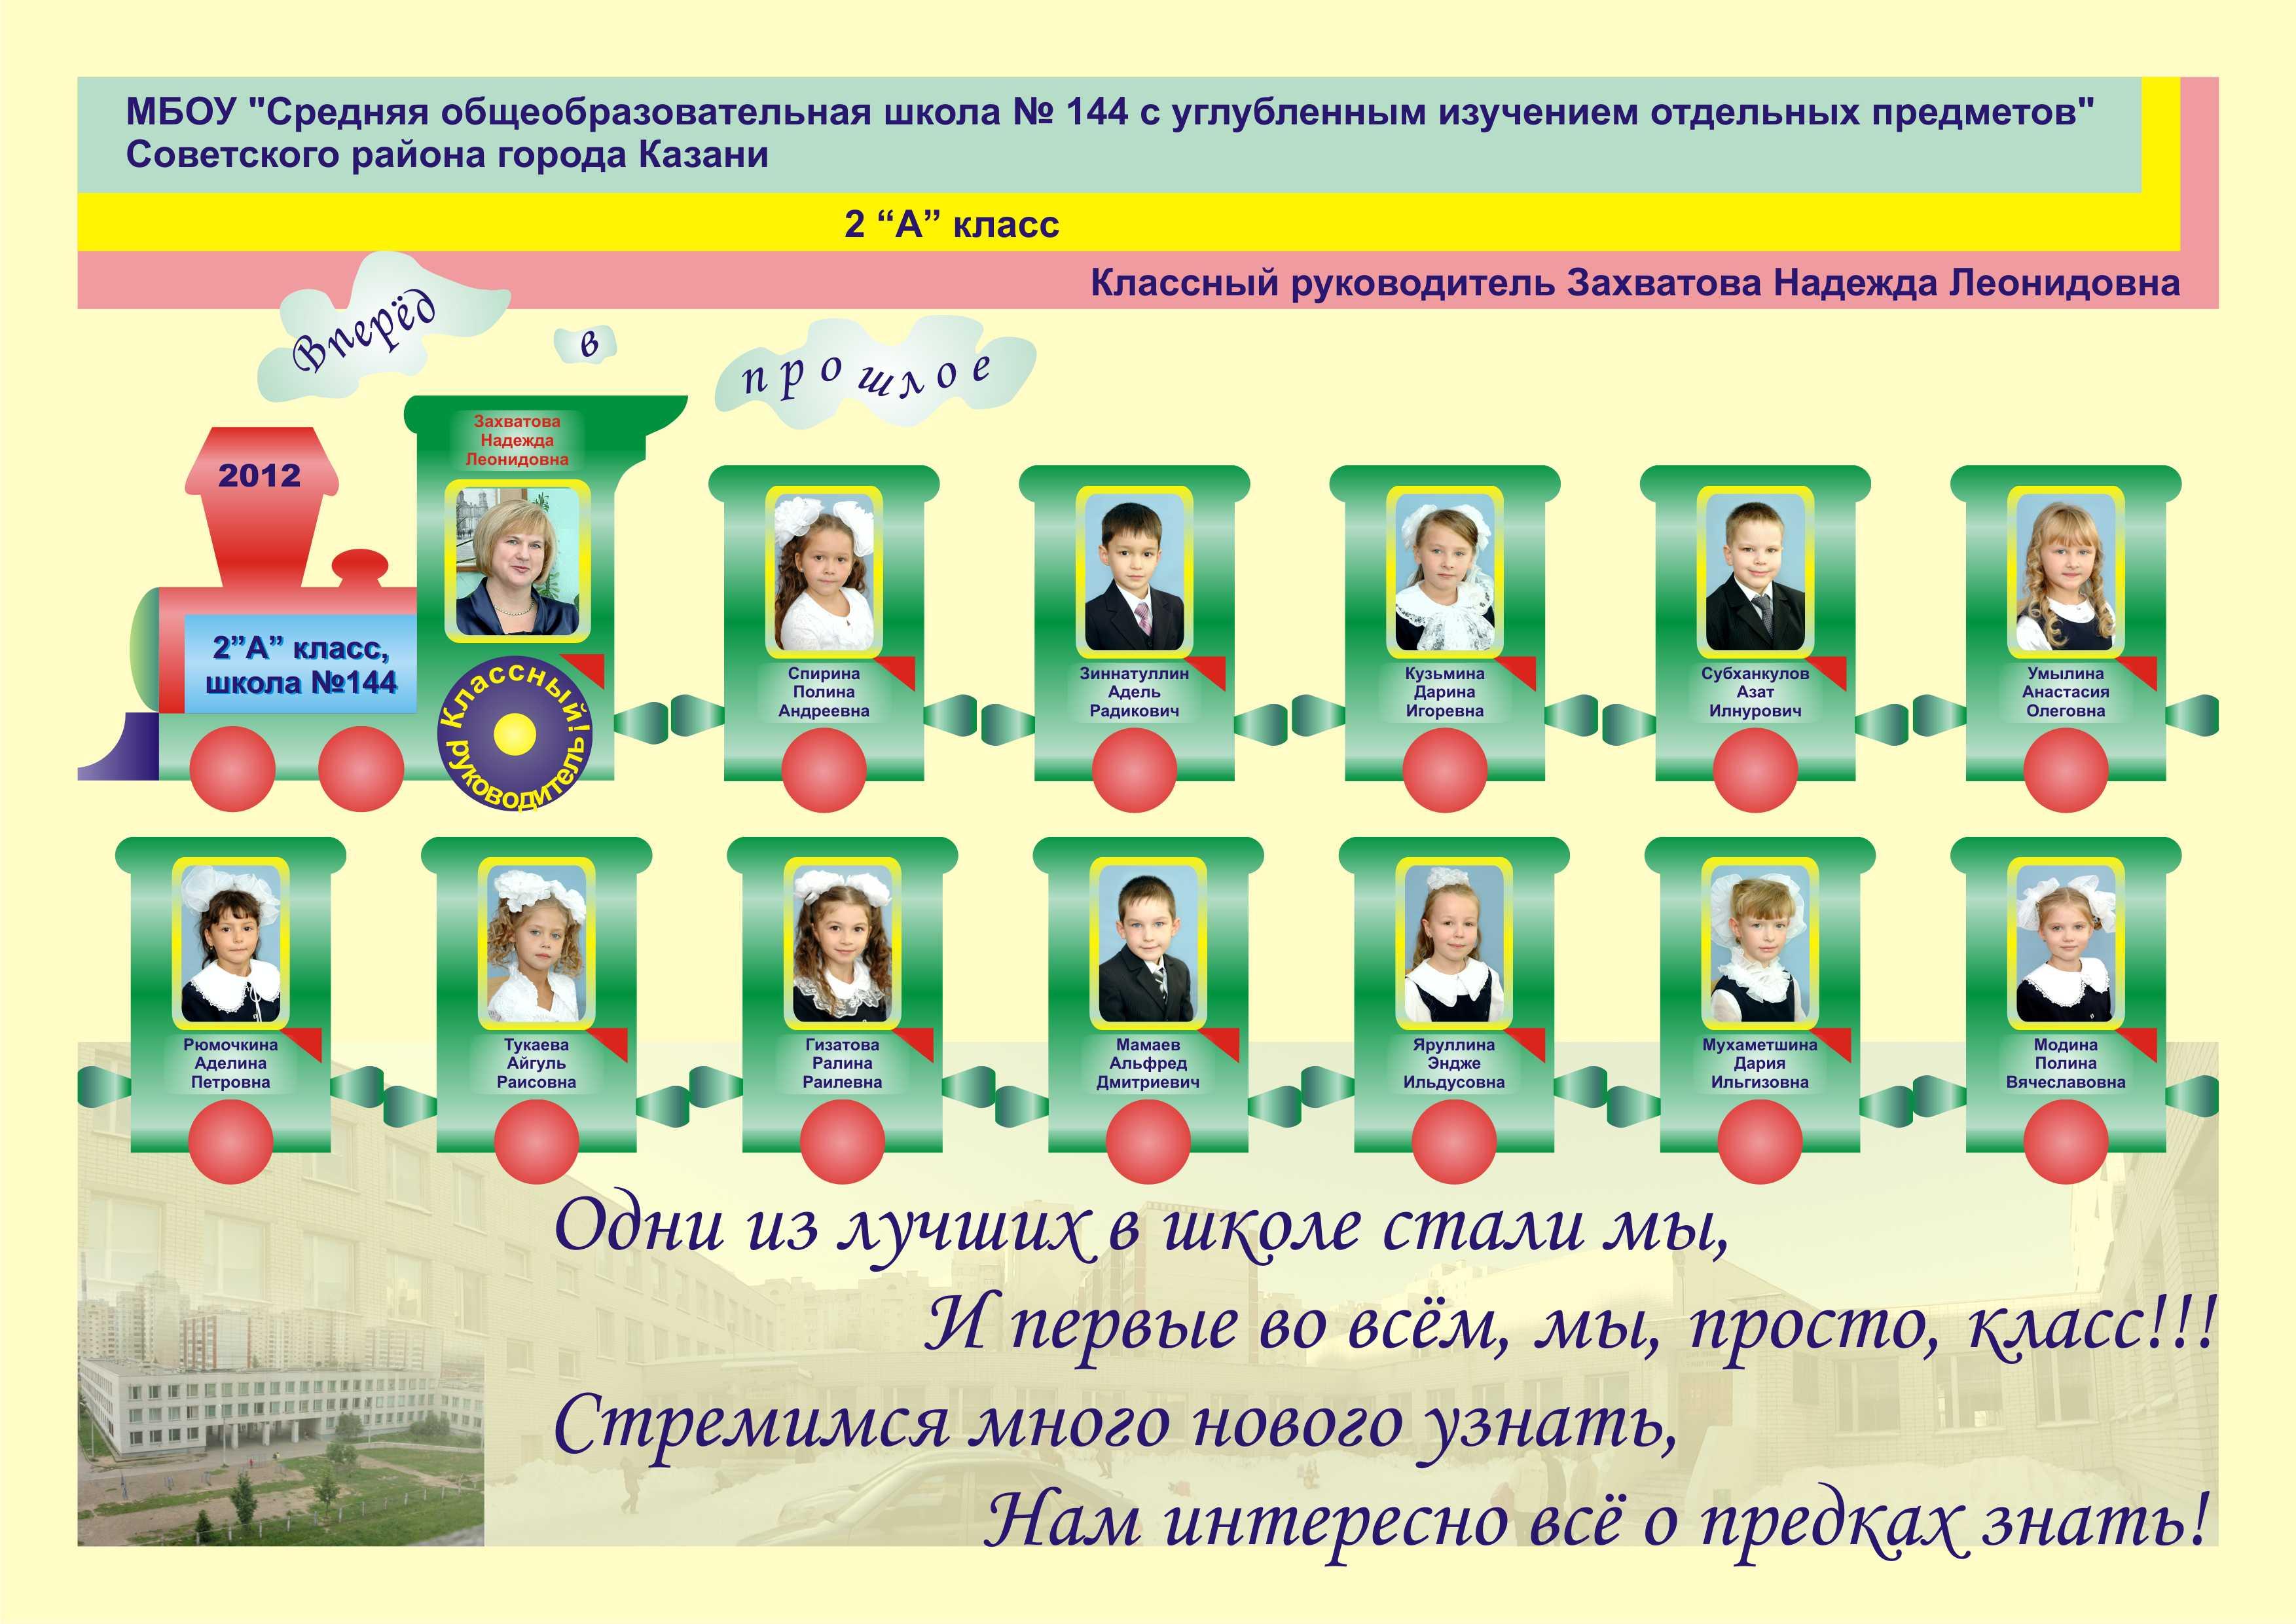 Визитная карточка для конкурса студента мои